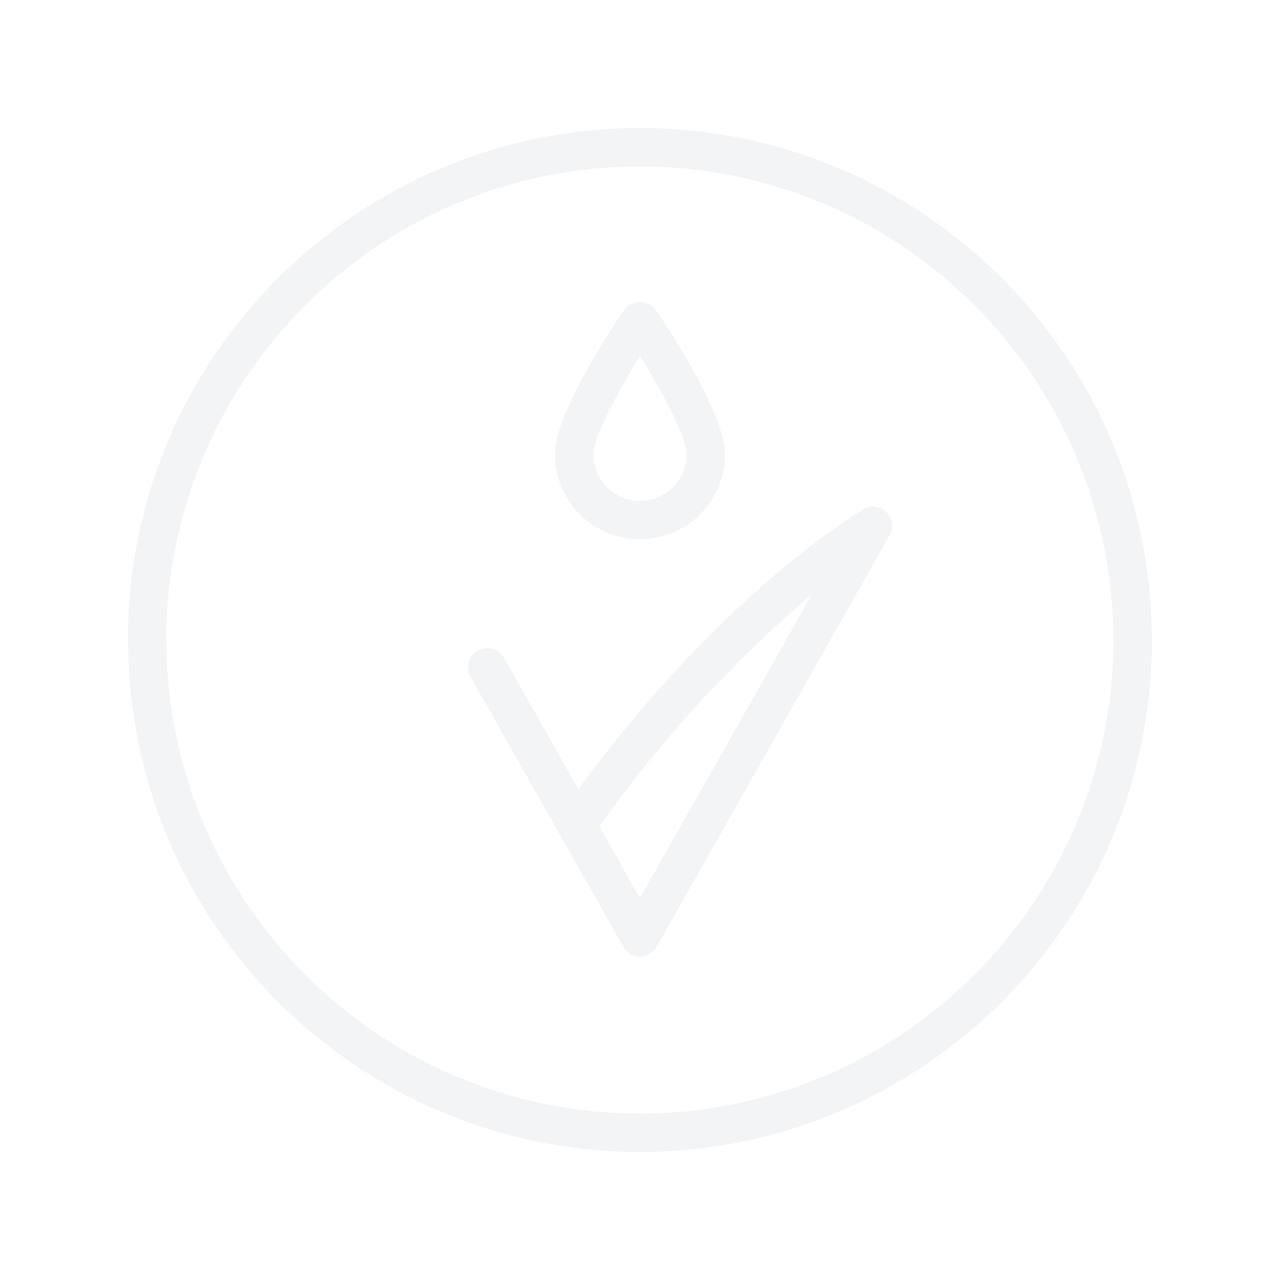 RICH Satin Touch Paddle Brush щетка для длинных волос